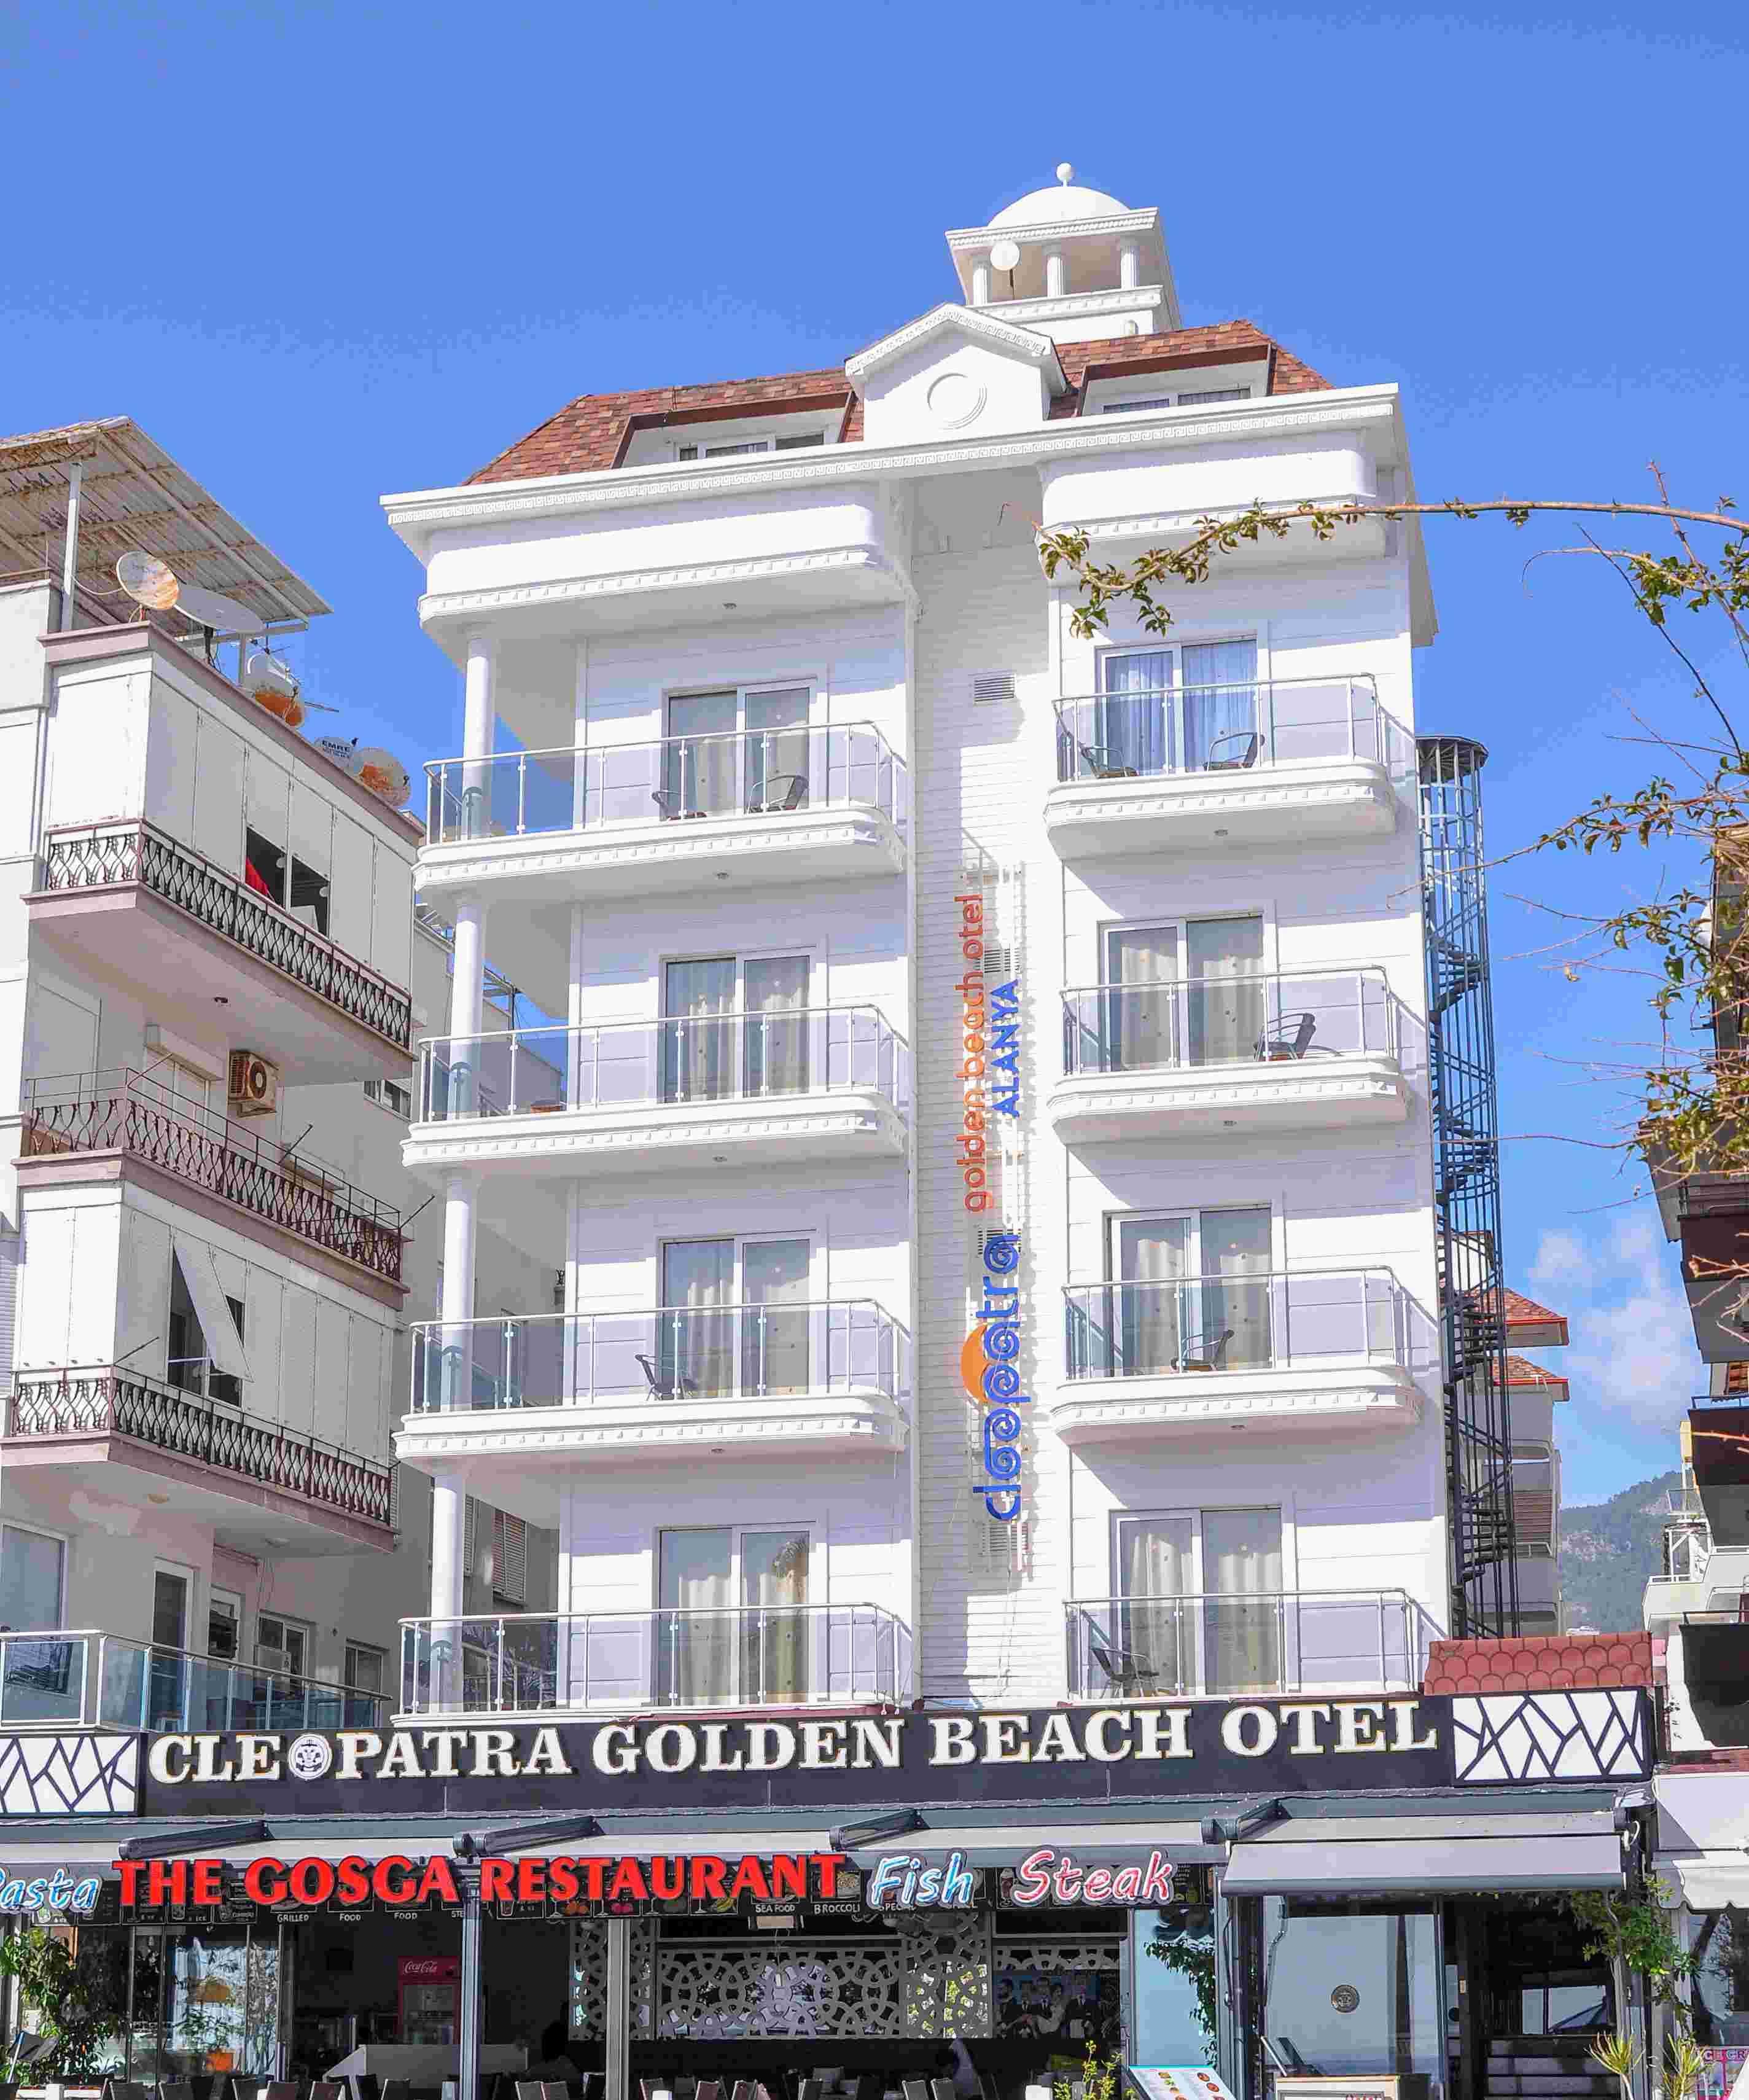 kleopatra-golden-beach-hotel-general-001